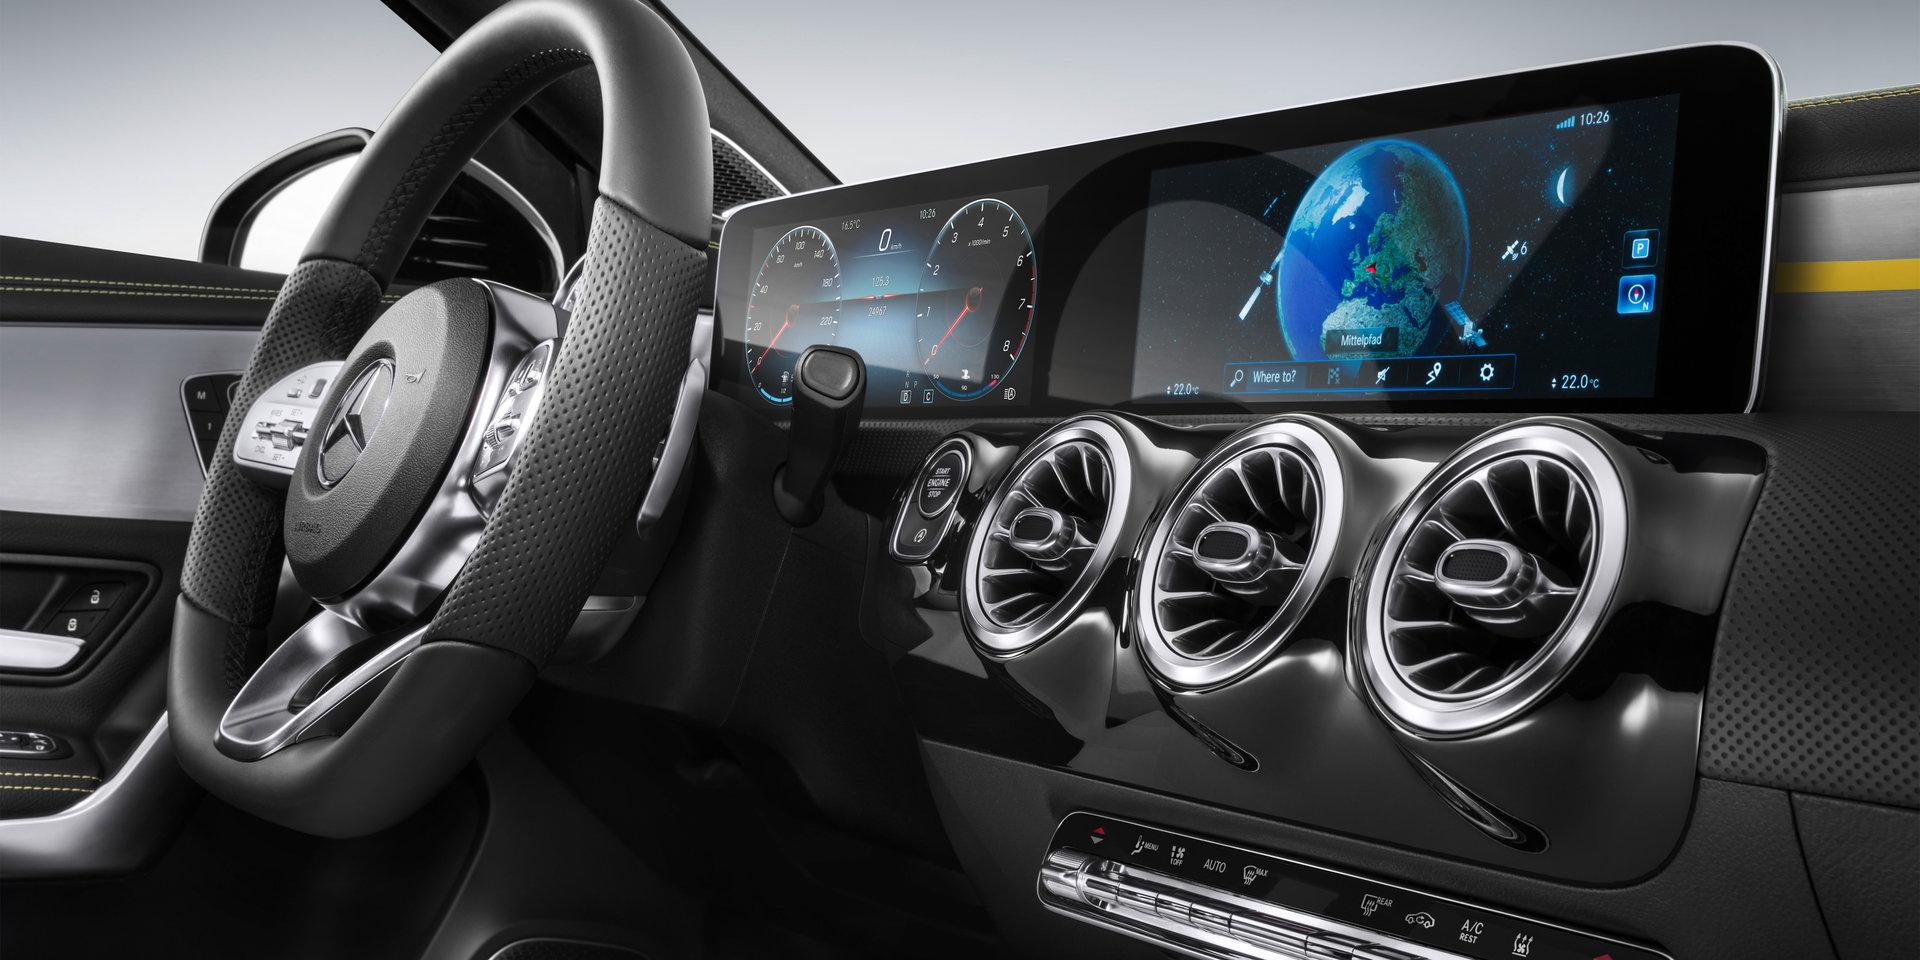 Photo of H Mercedes-Benz θα παρουσιάσει στο Λας Βέγκας τη νέα γενιά πολυμέσων